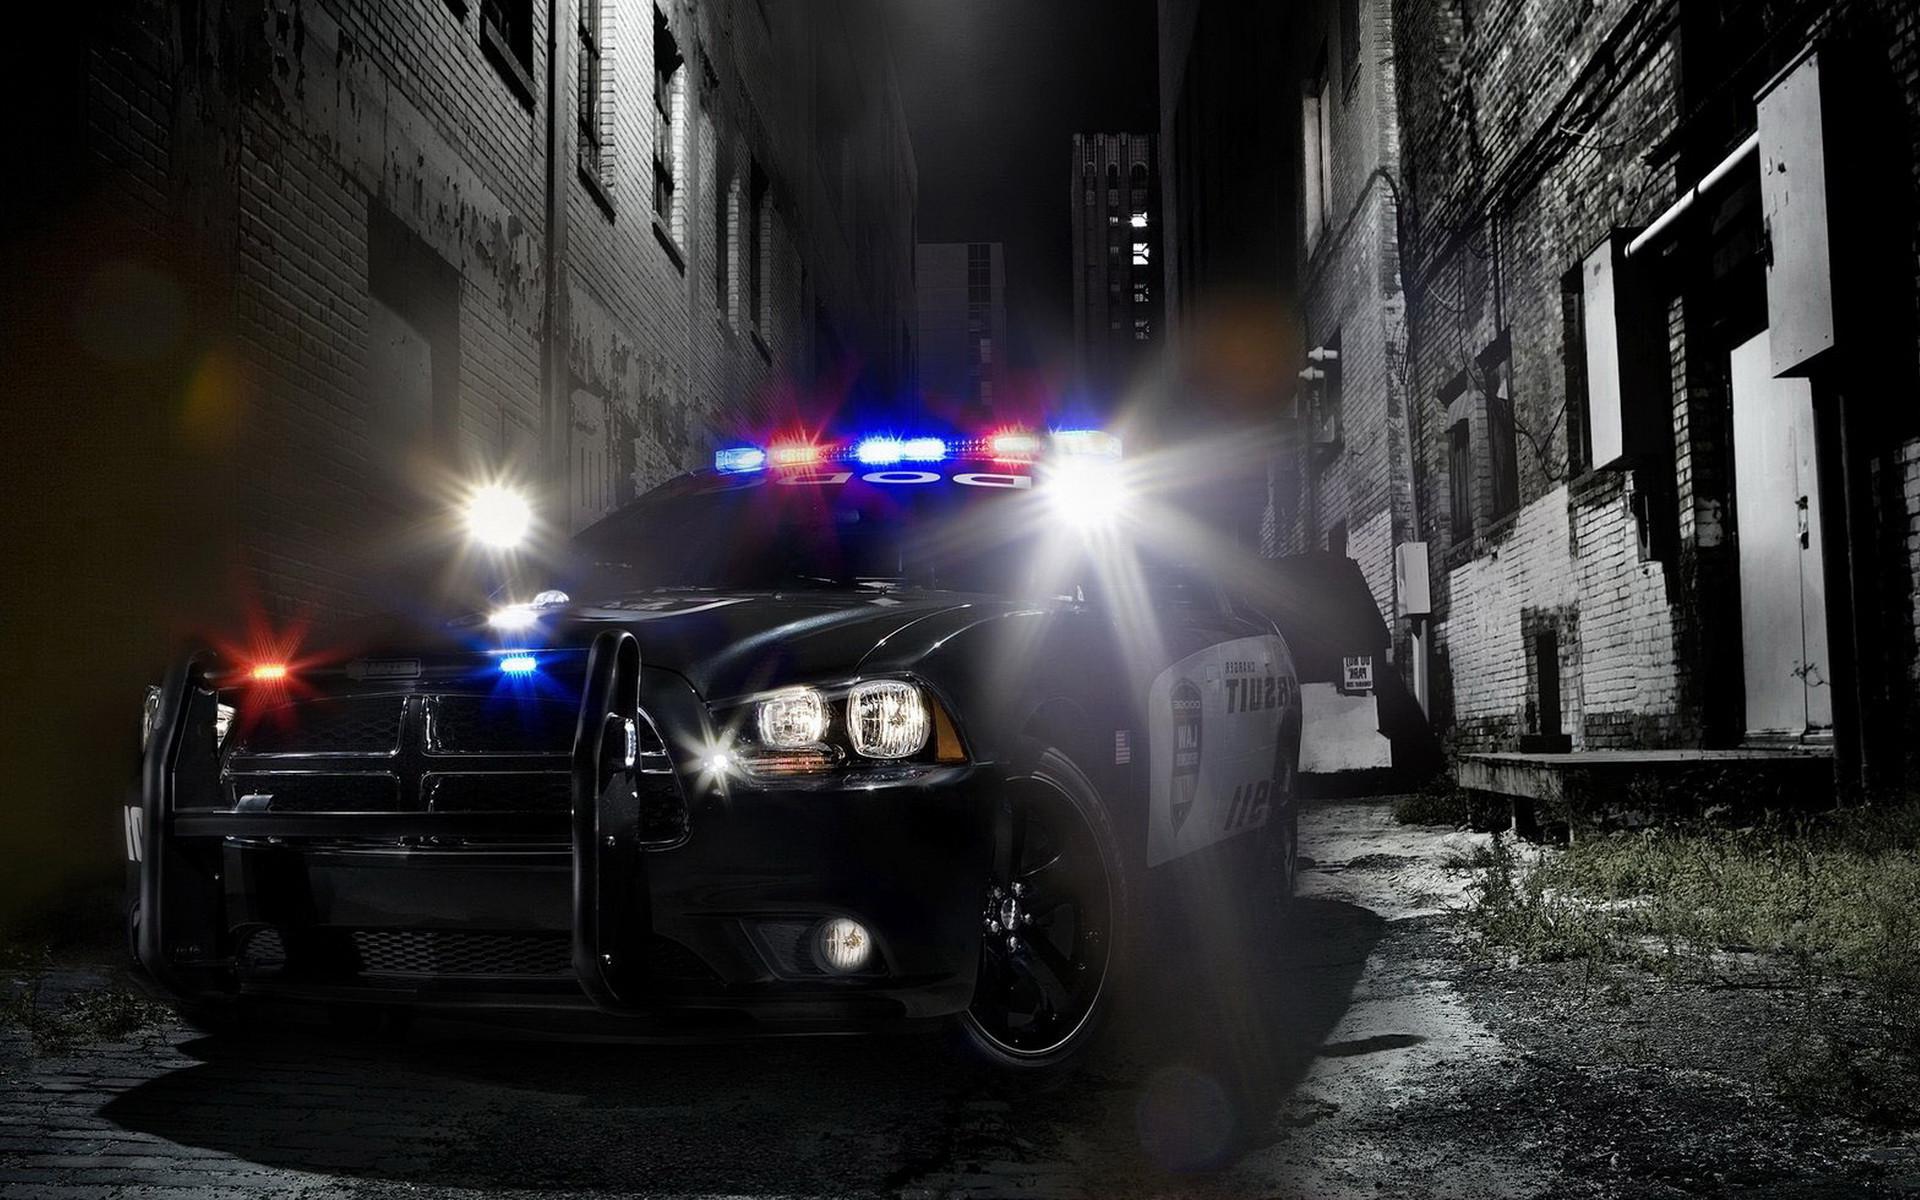 Cop Car Wallpaper Police Car Wallpaper Backgrounds 66 Images